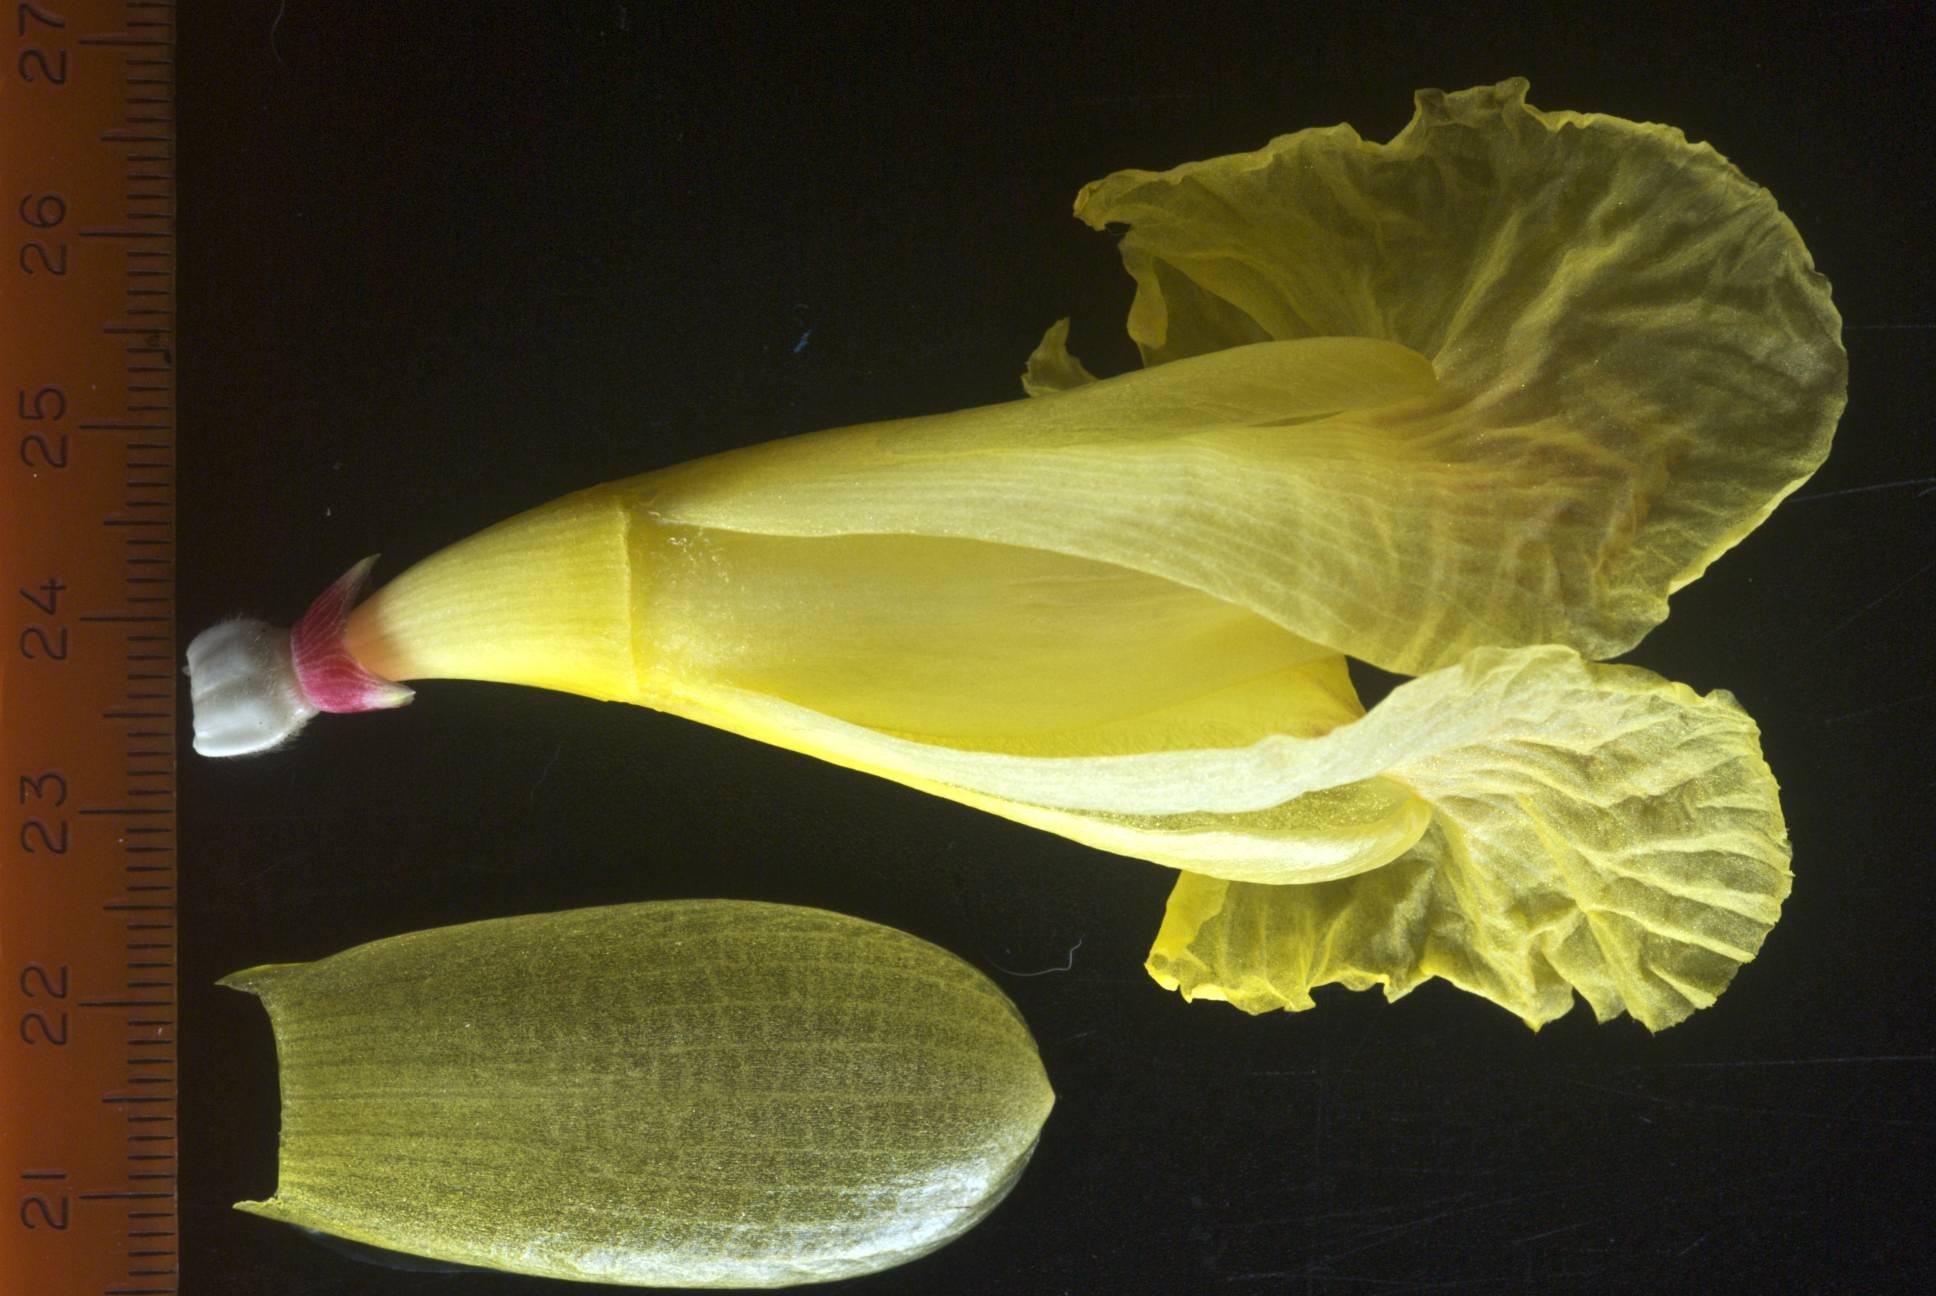 Photo# 15671 - Costus 'Mellow Yellow' - photos by John Mood